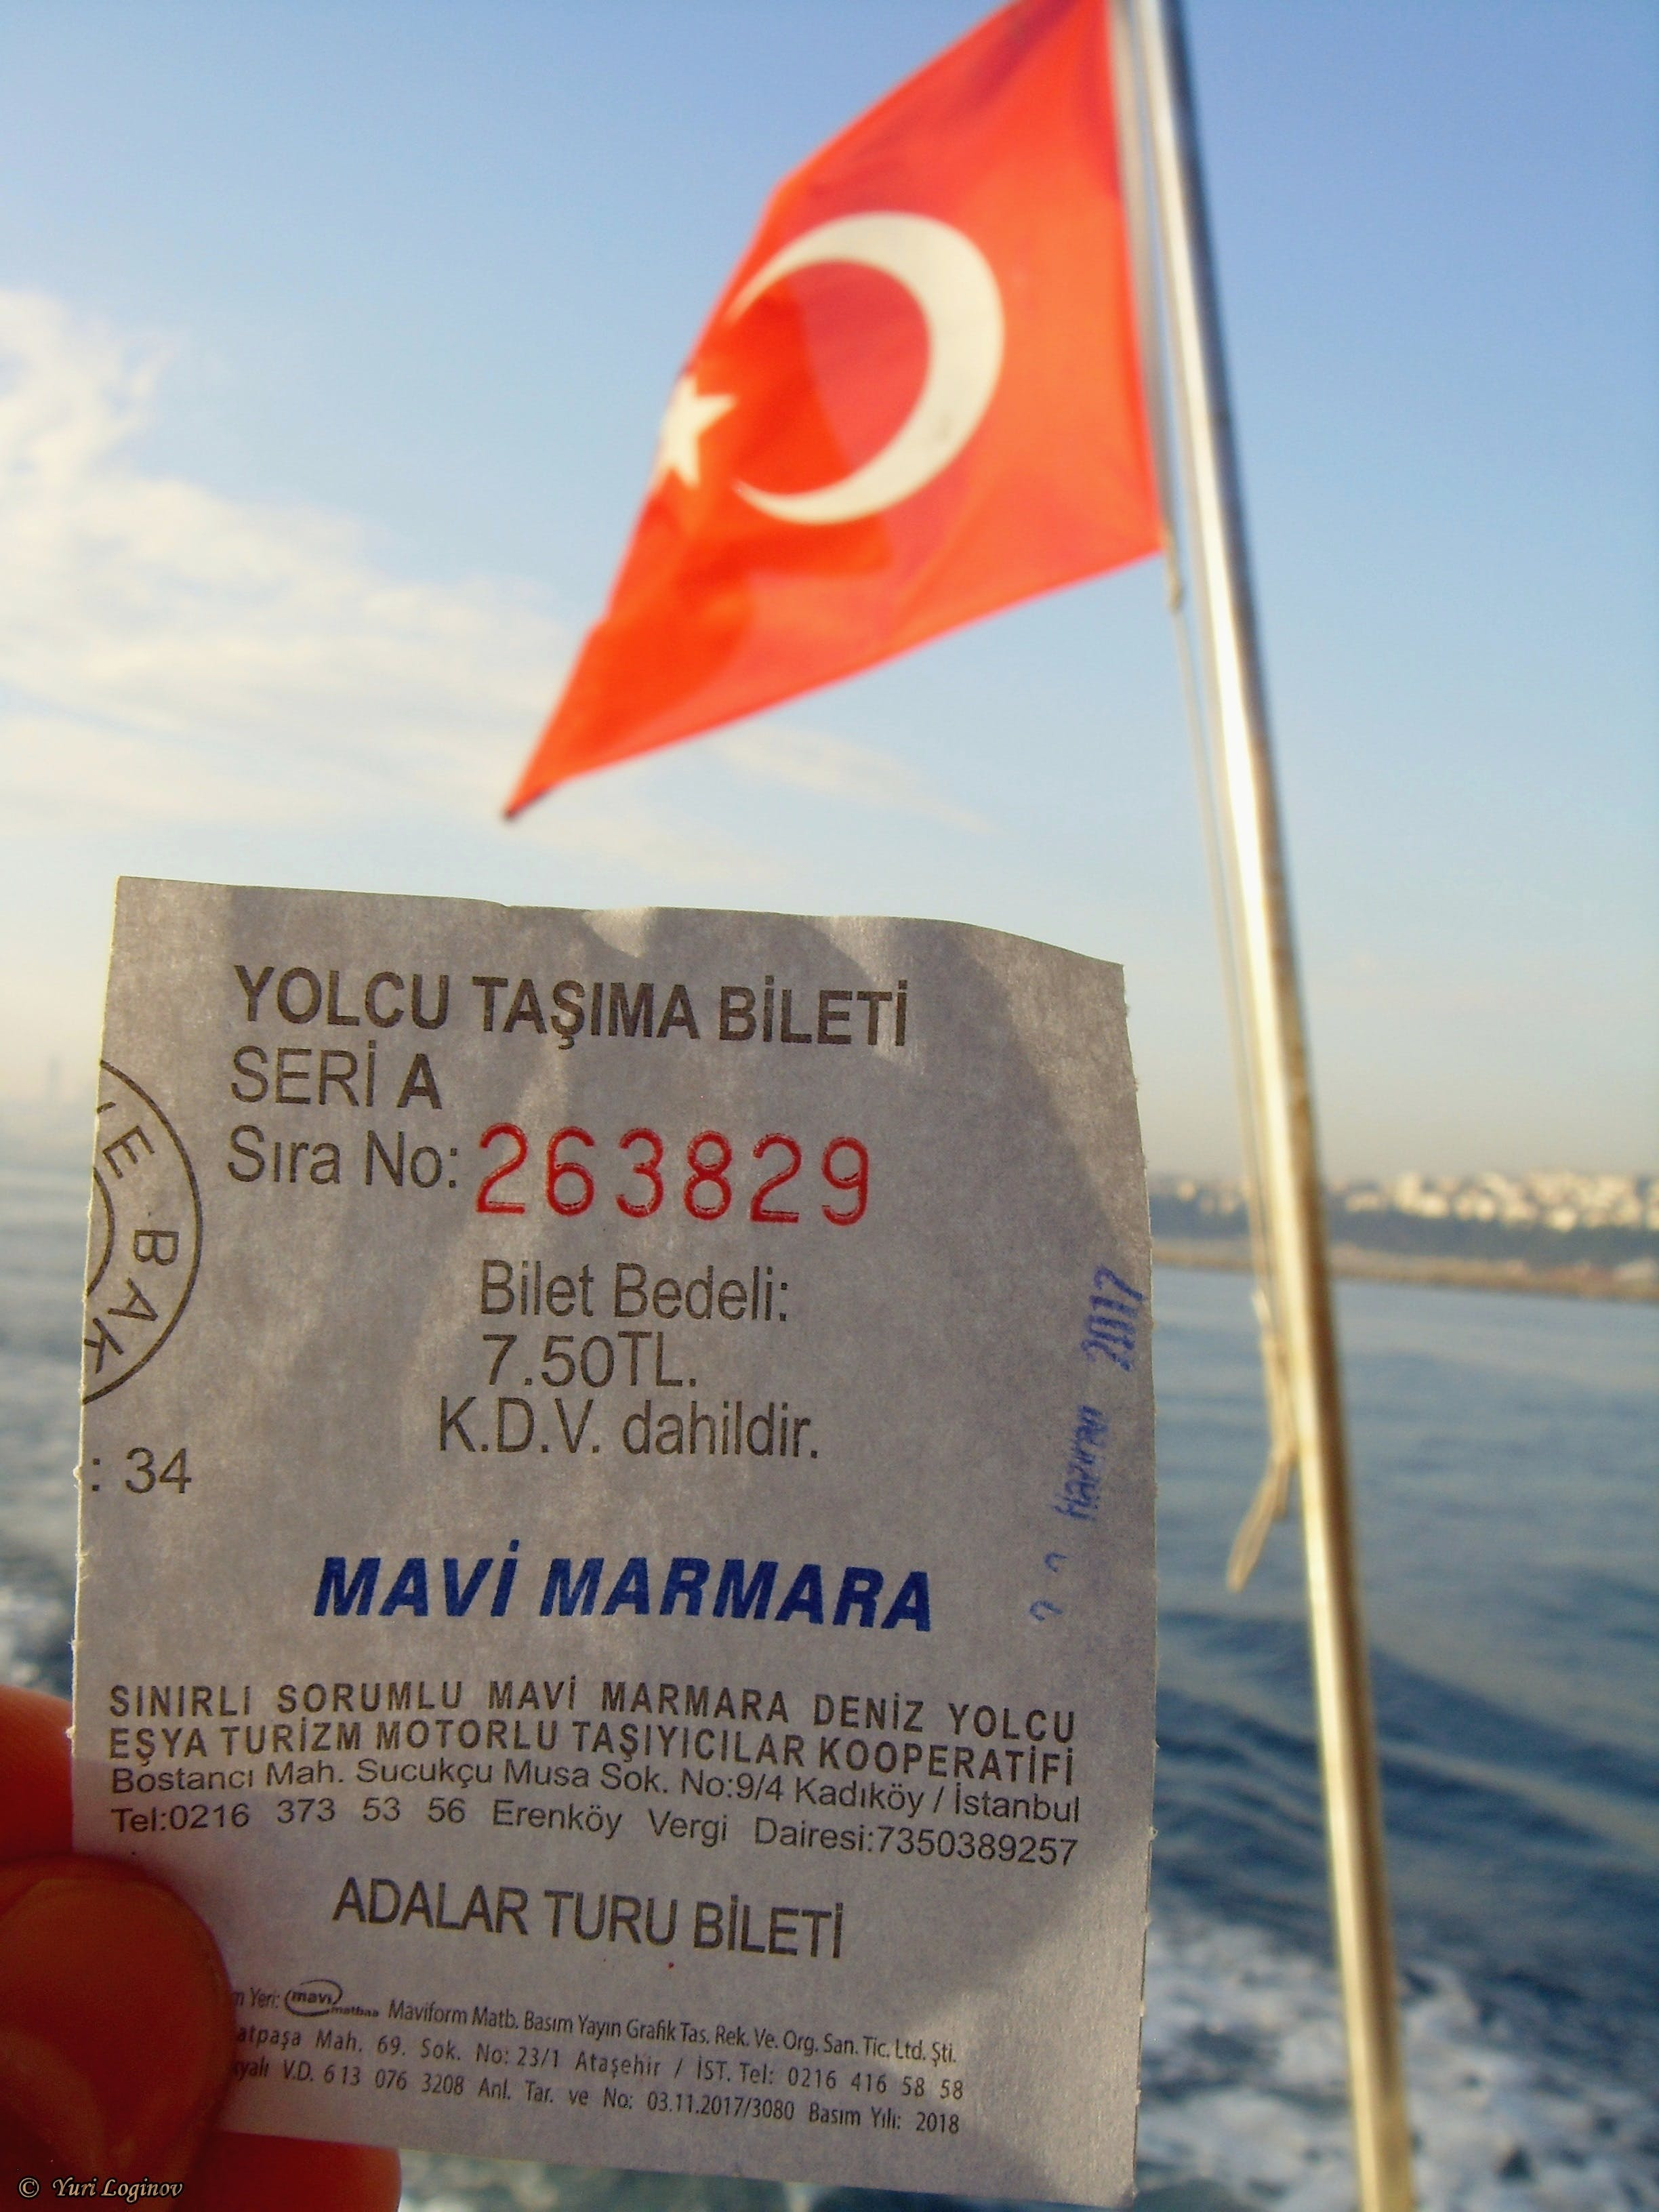 Free stock photo of turkey, Istanbul, TÜRKİYE, bosphorus